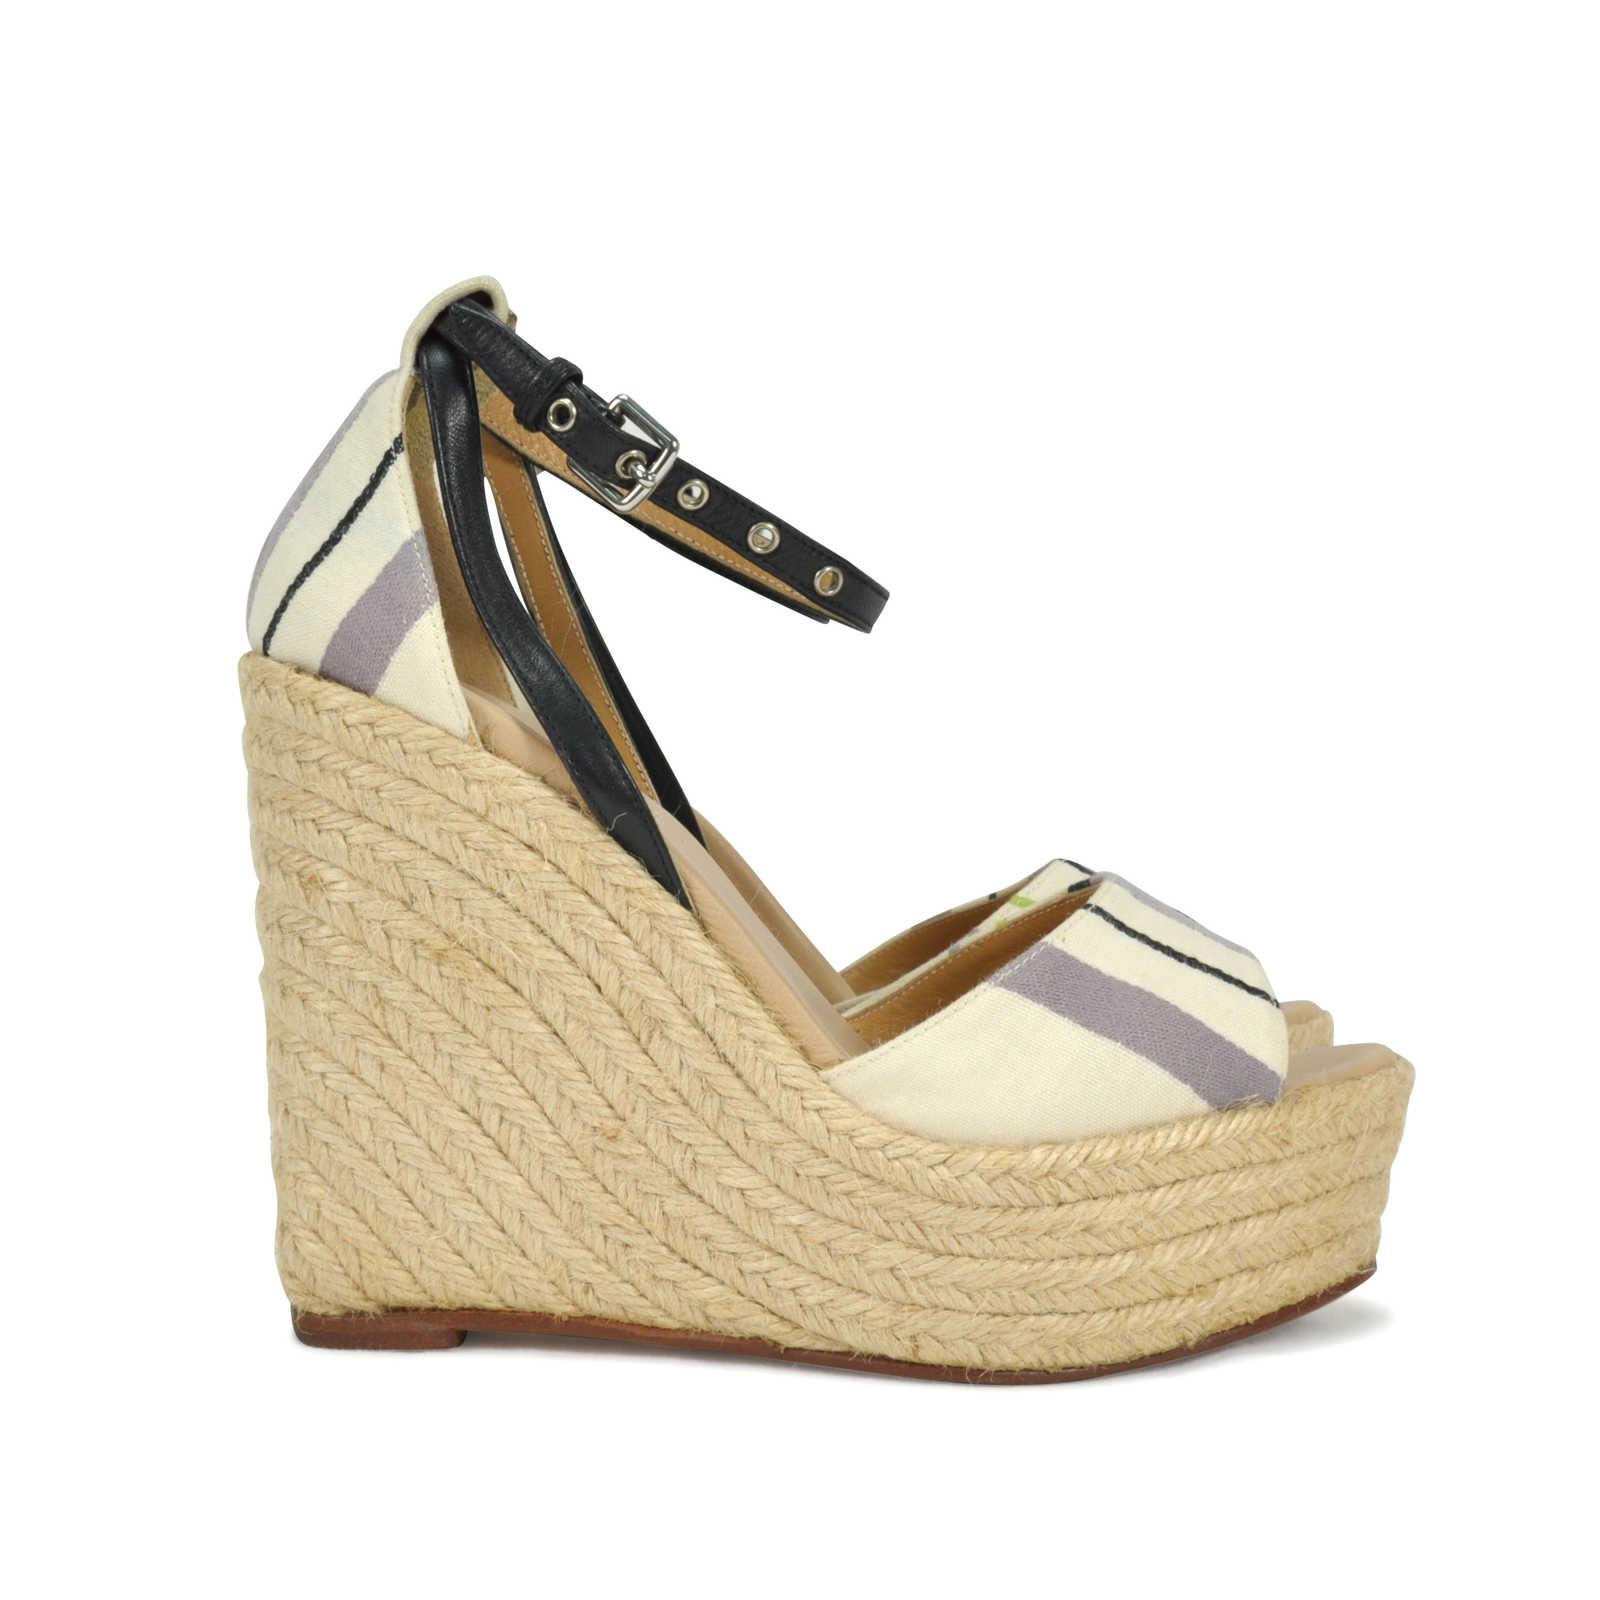 e068b5165471 ... Authentic Second Hand Hermès Fabric Espadrille Wedges (PSS-014-00036) -  Thumbnail ...